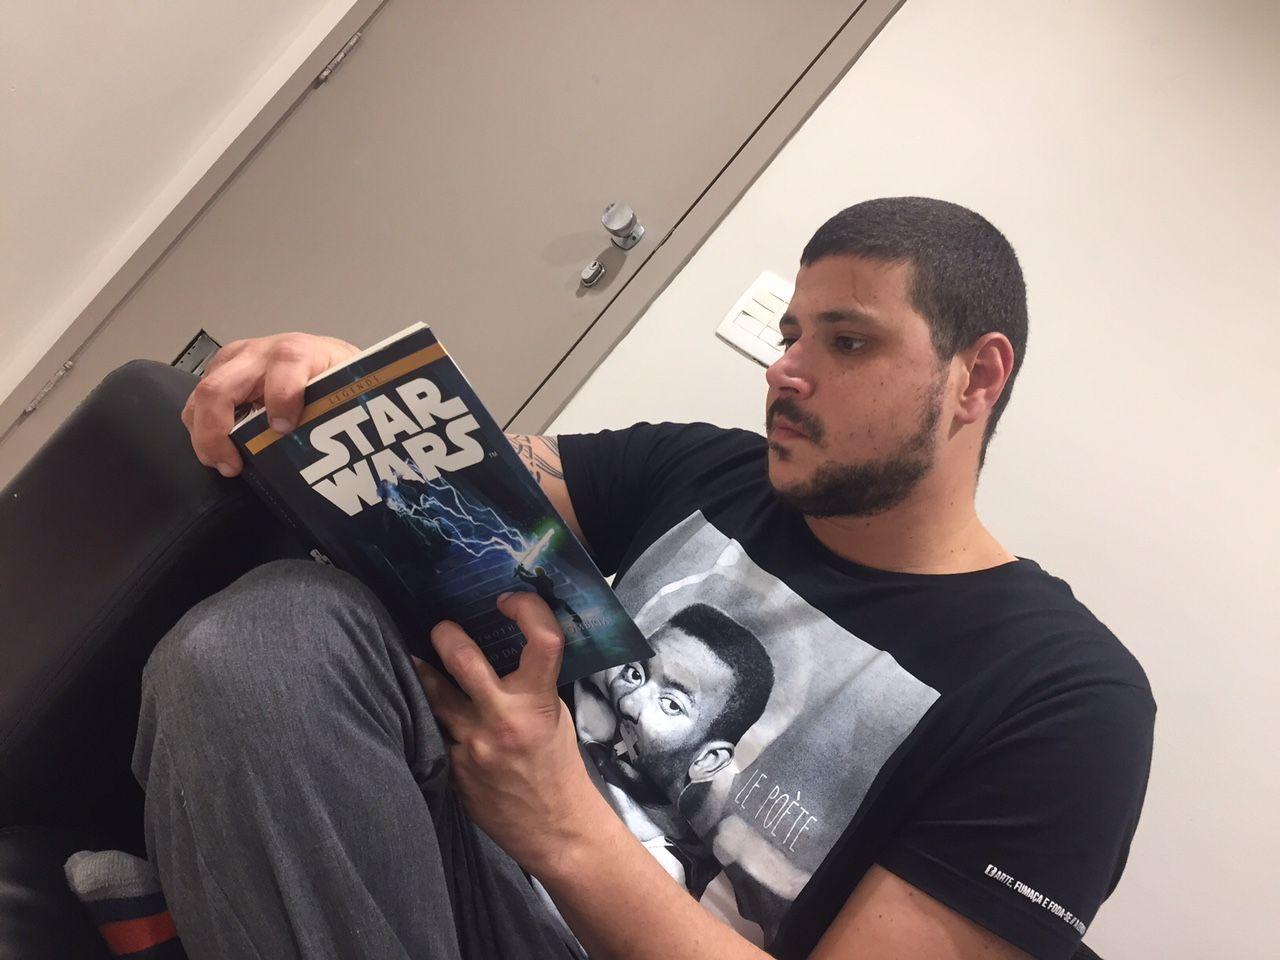 Raul Lemos apostou na leitura para relaxar antes da final